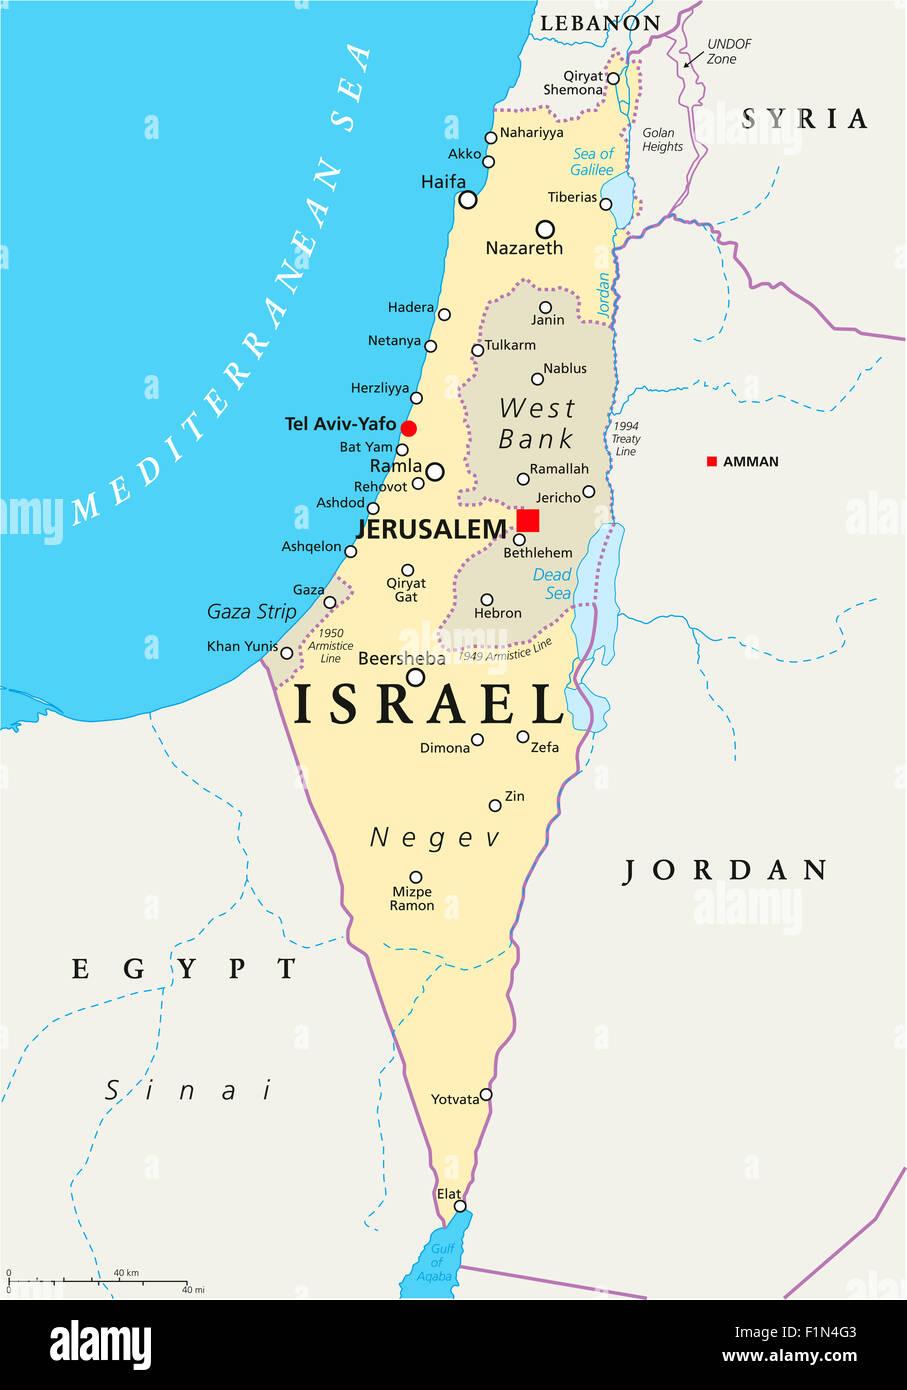 Israel political map with capital Jerusalem, national ...